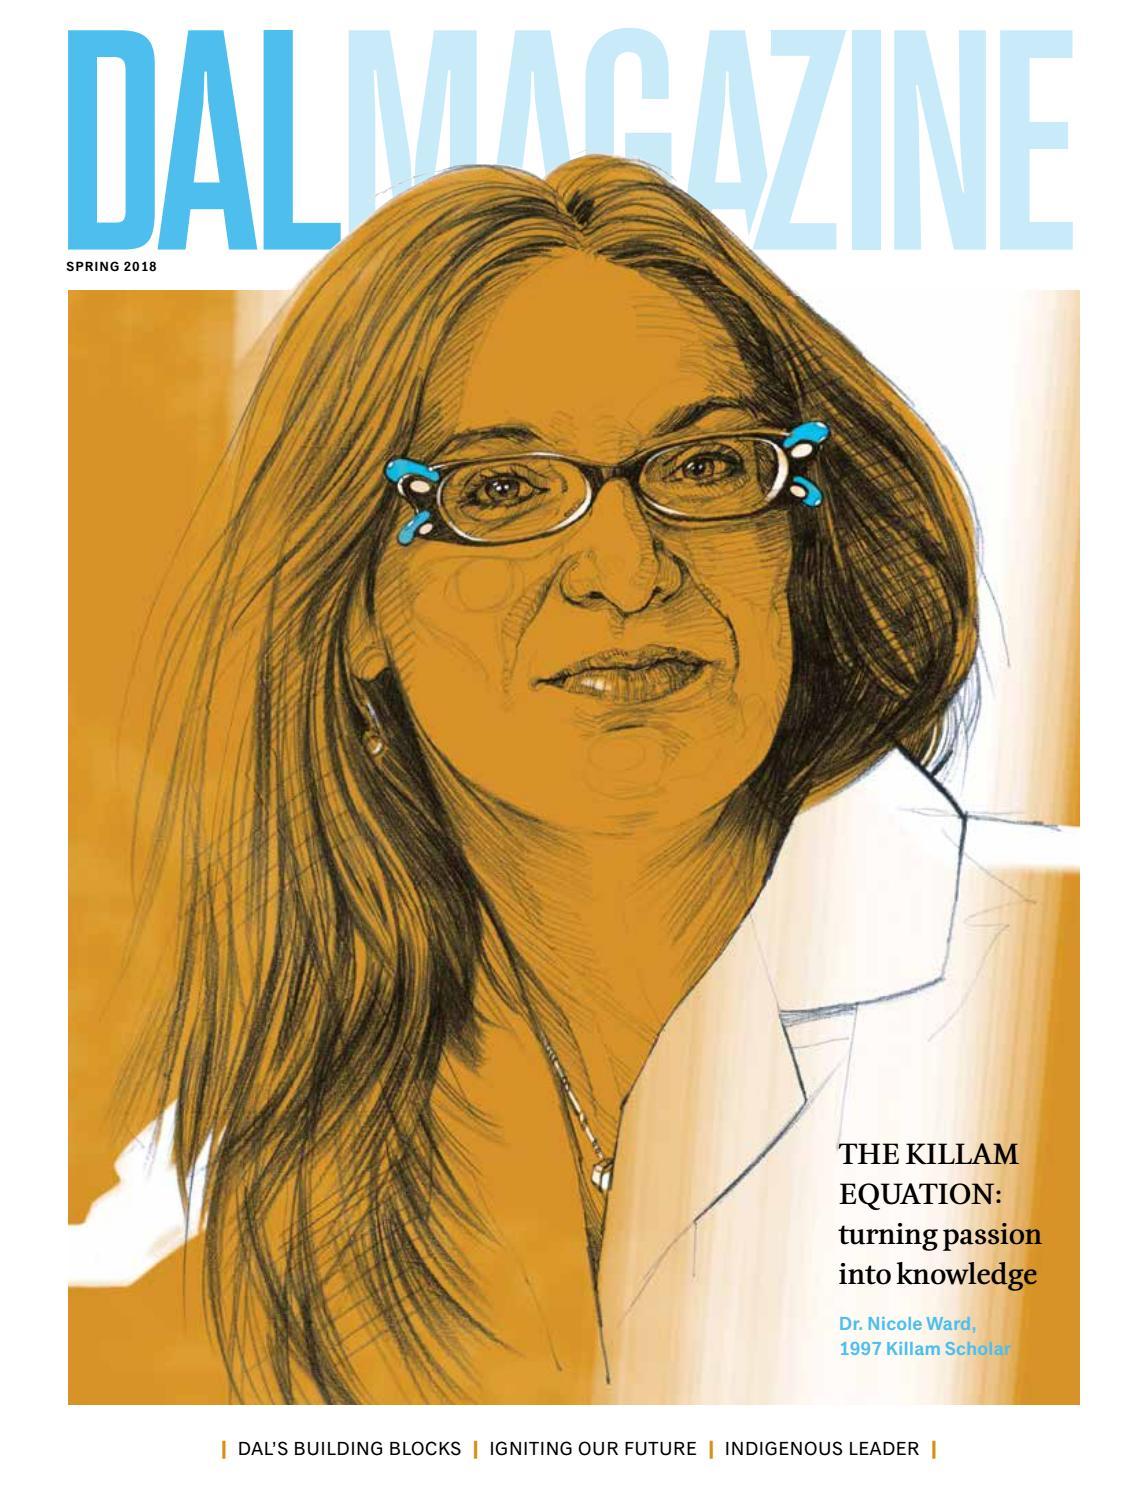 Dal Magazine Spring 2018 by Dalhousie University - Issuu